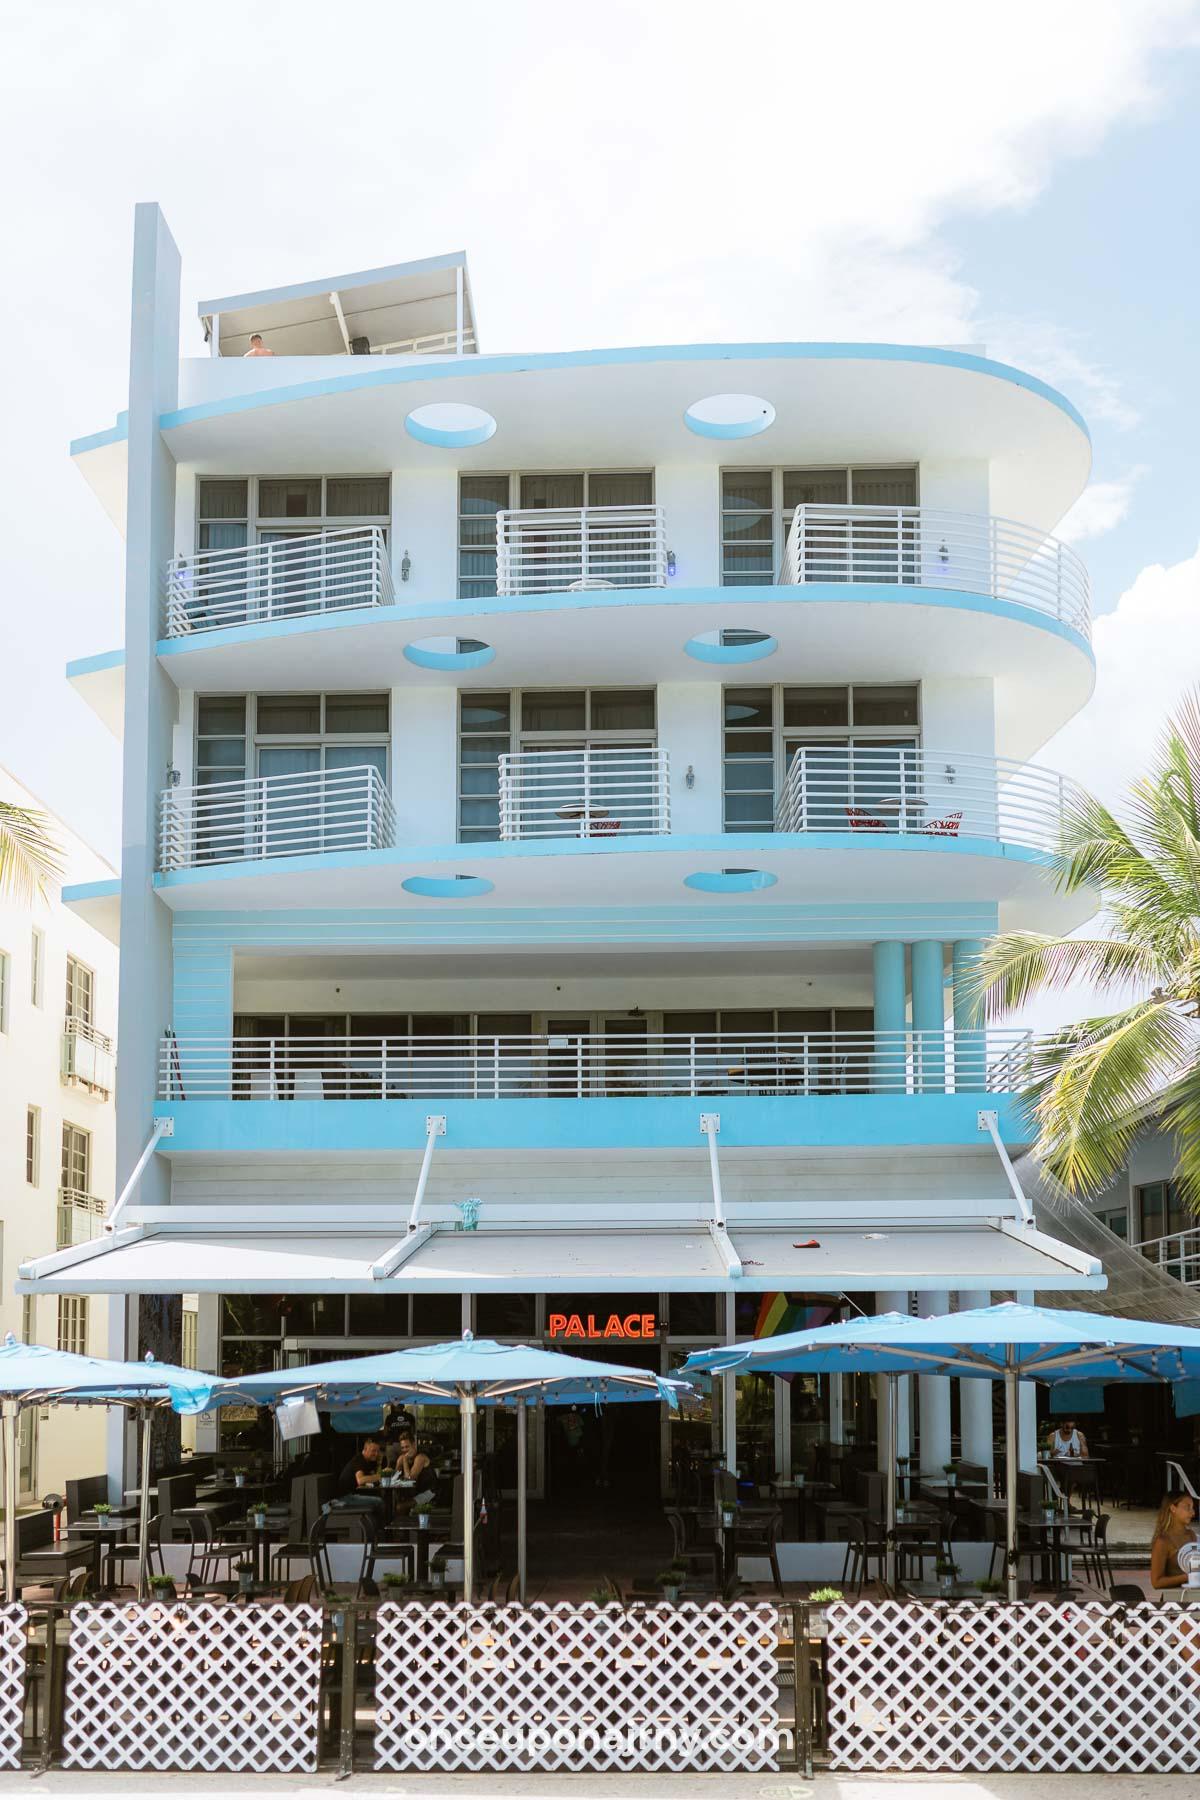 Palace Miami South Beach Drag Brunch